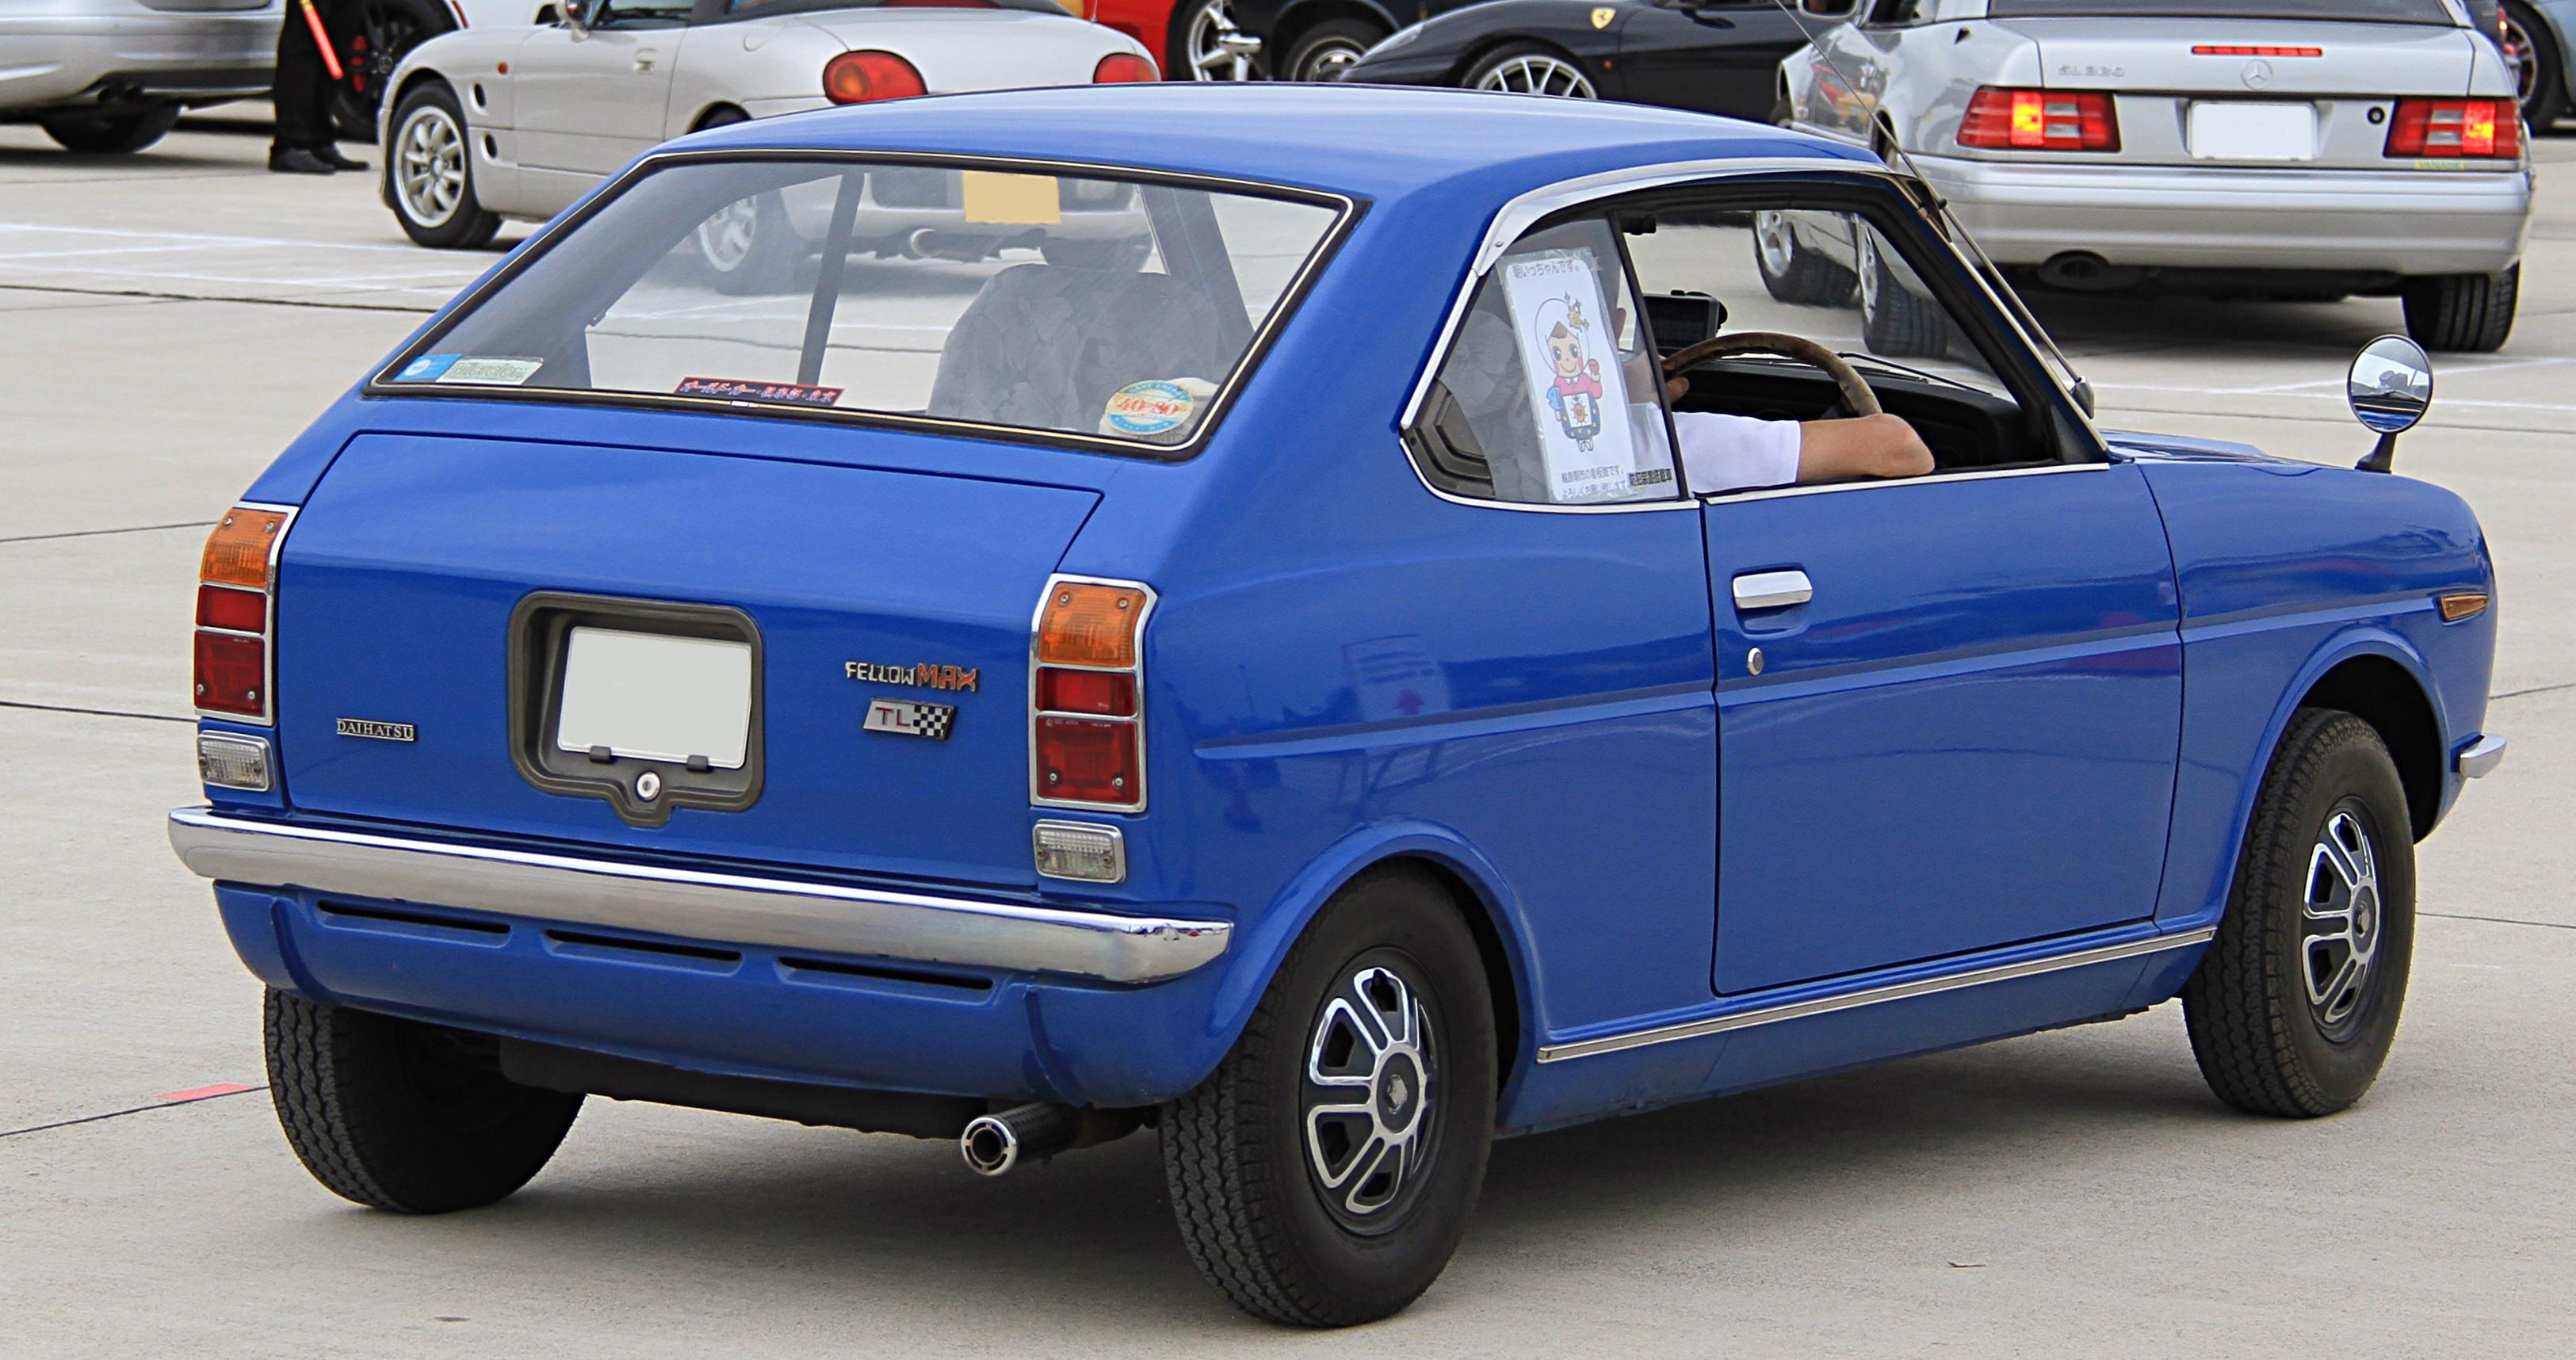 Daihatsu Fellow I 1966 - 1970 Sedan 2 door #4